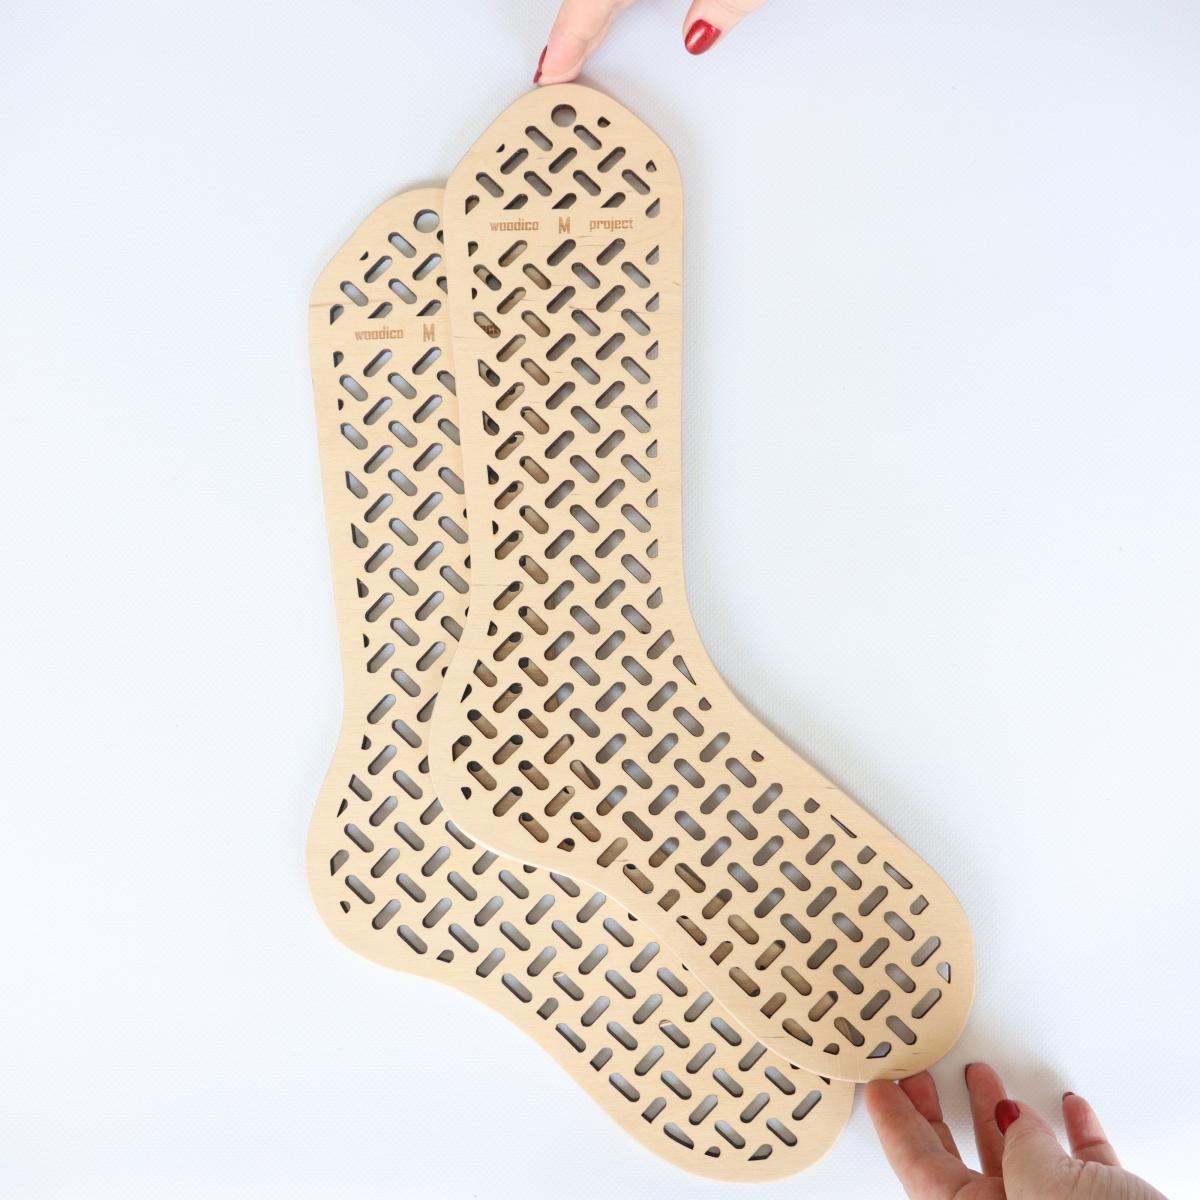 woodico.pro wooden sock blockers stitches 4 1200x1200 - Wooden sock blockers / Stitches